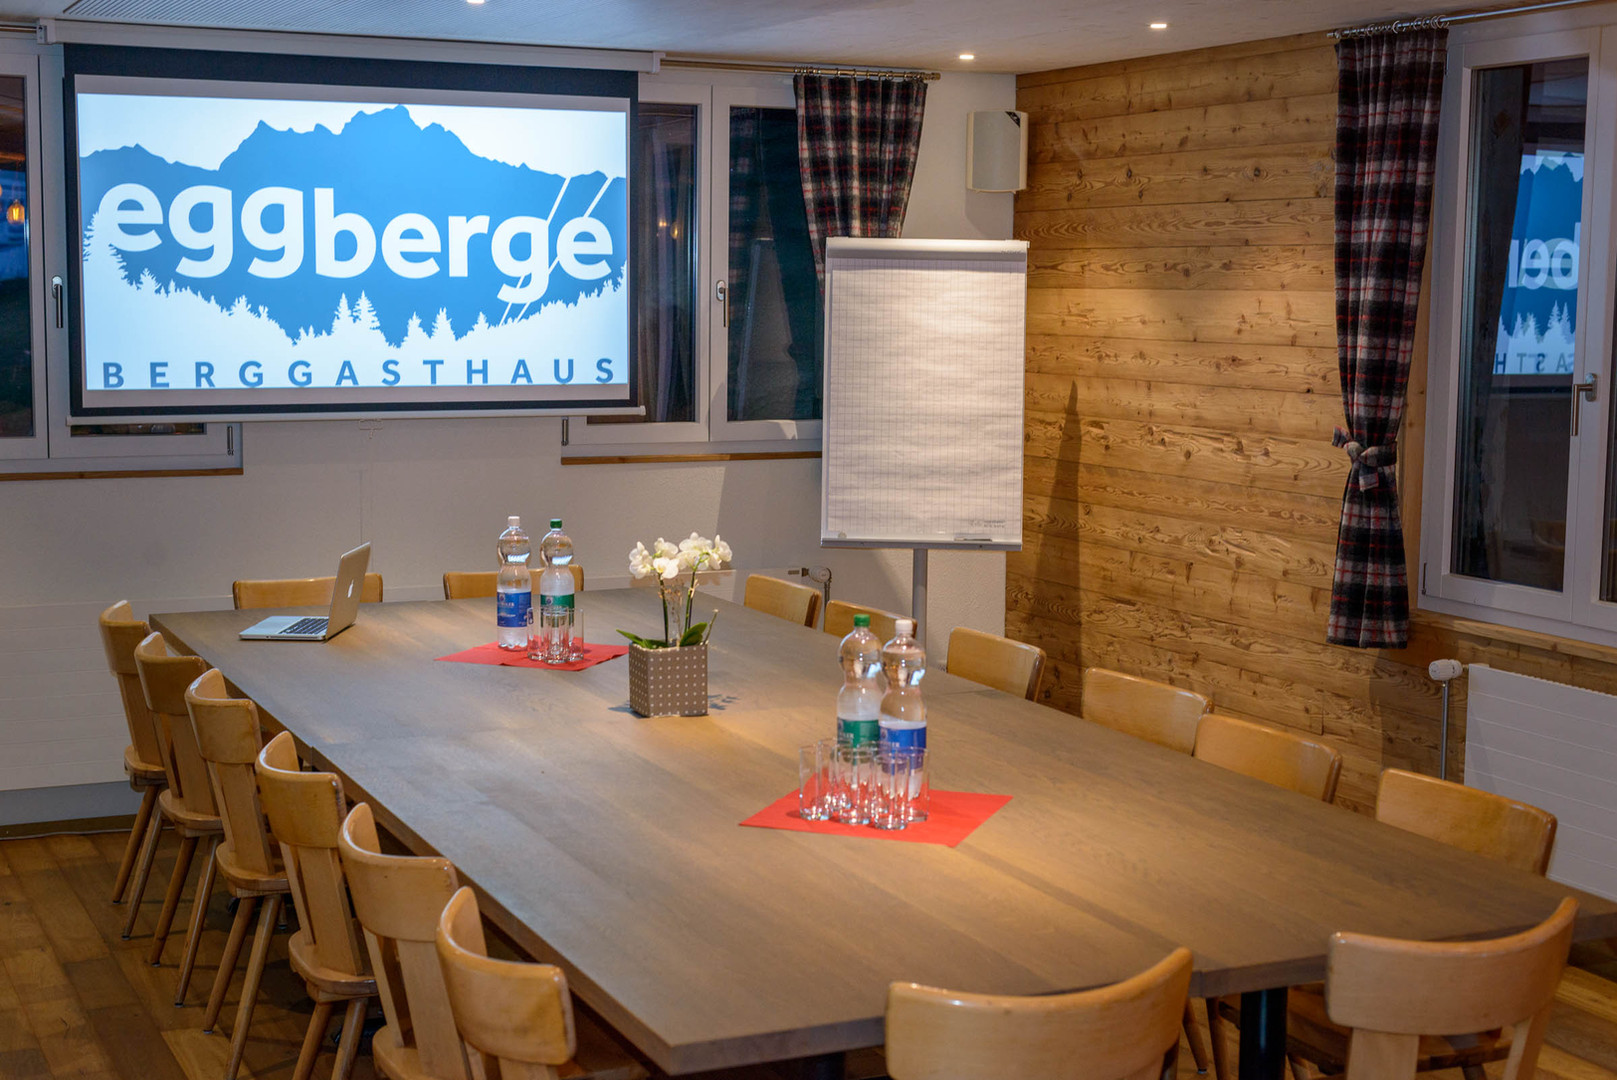 Berggasthhaus Eggberge Seminarraum